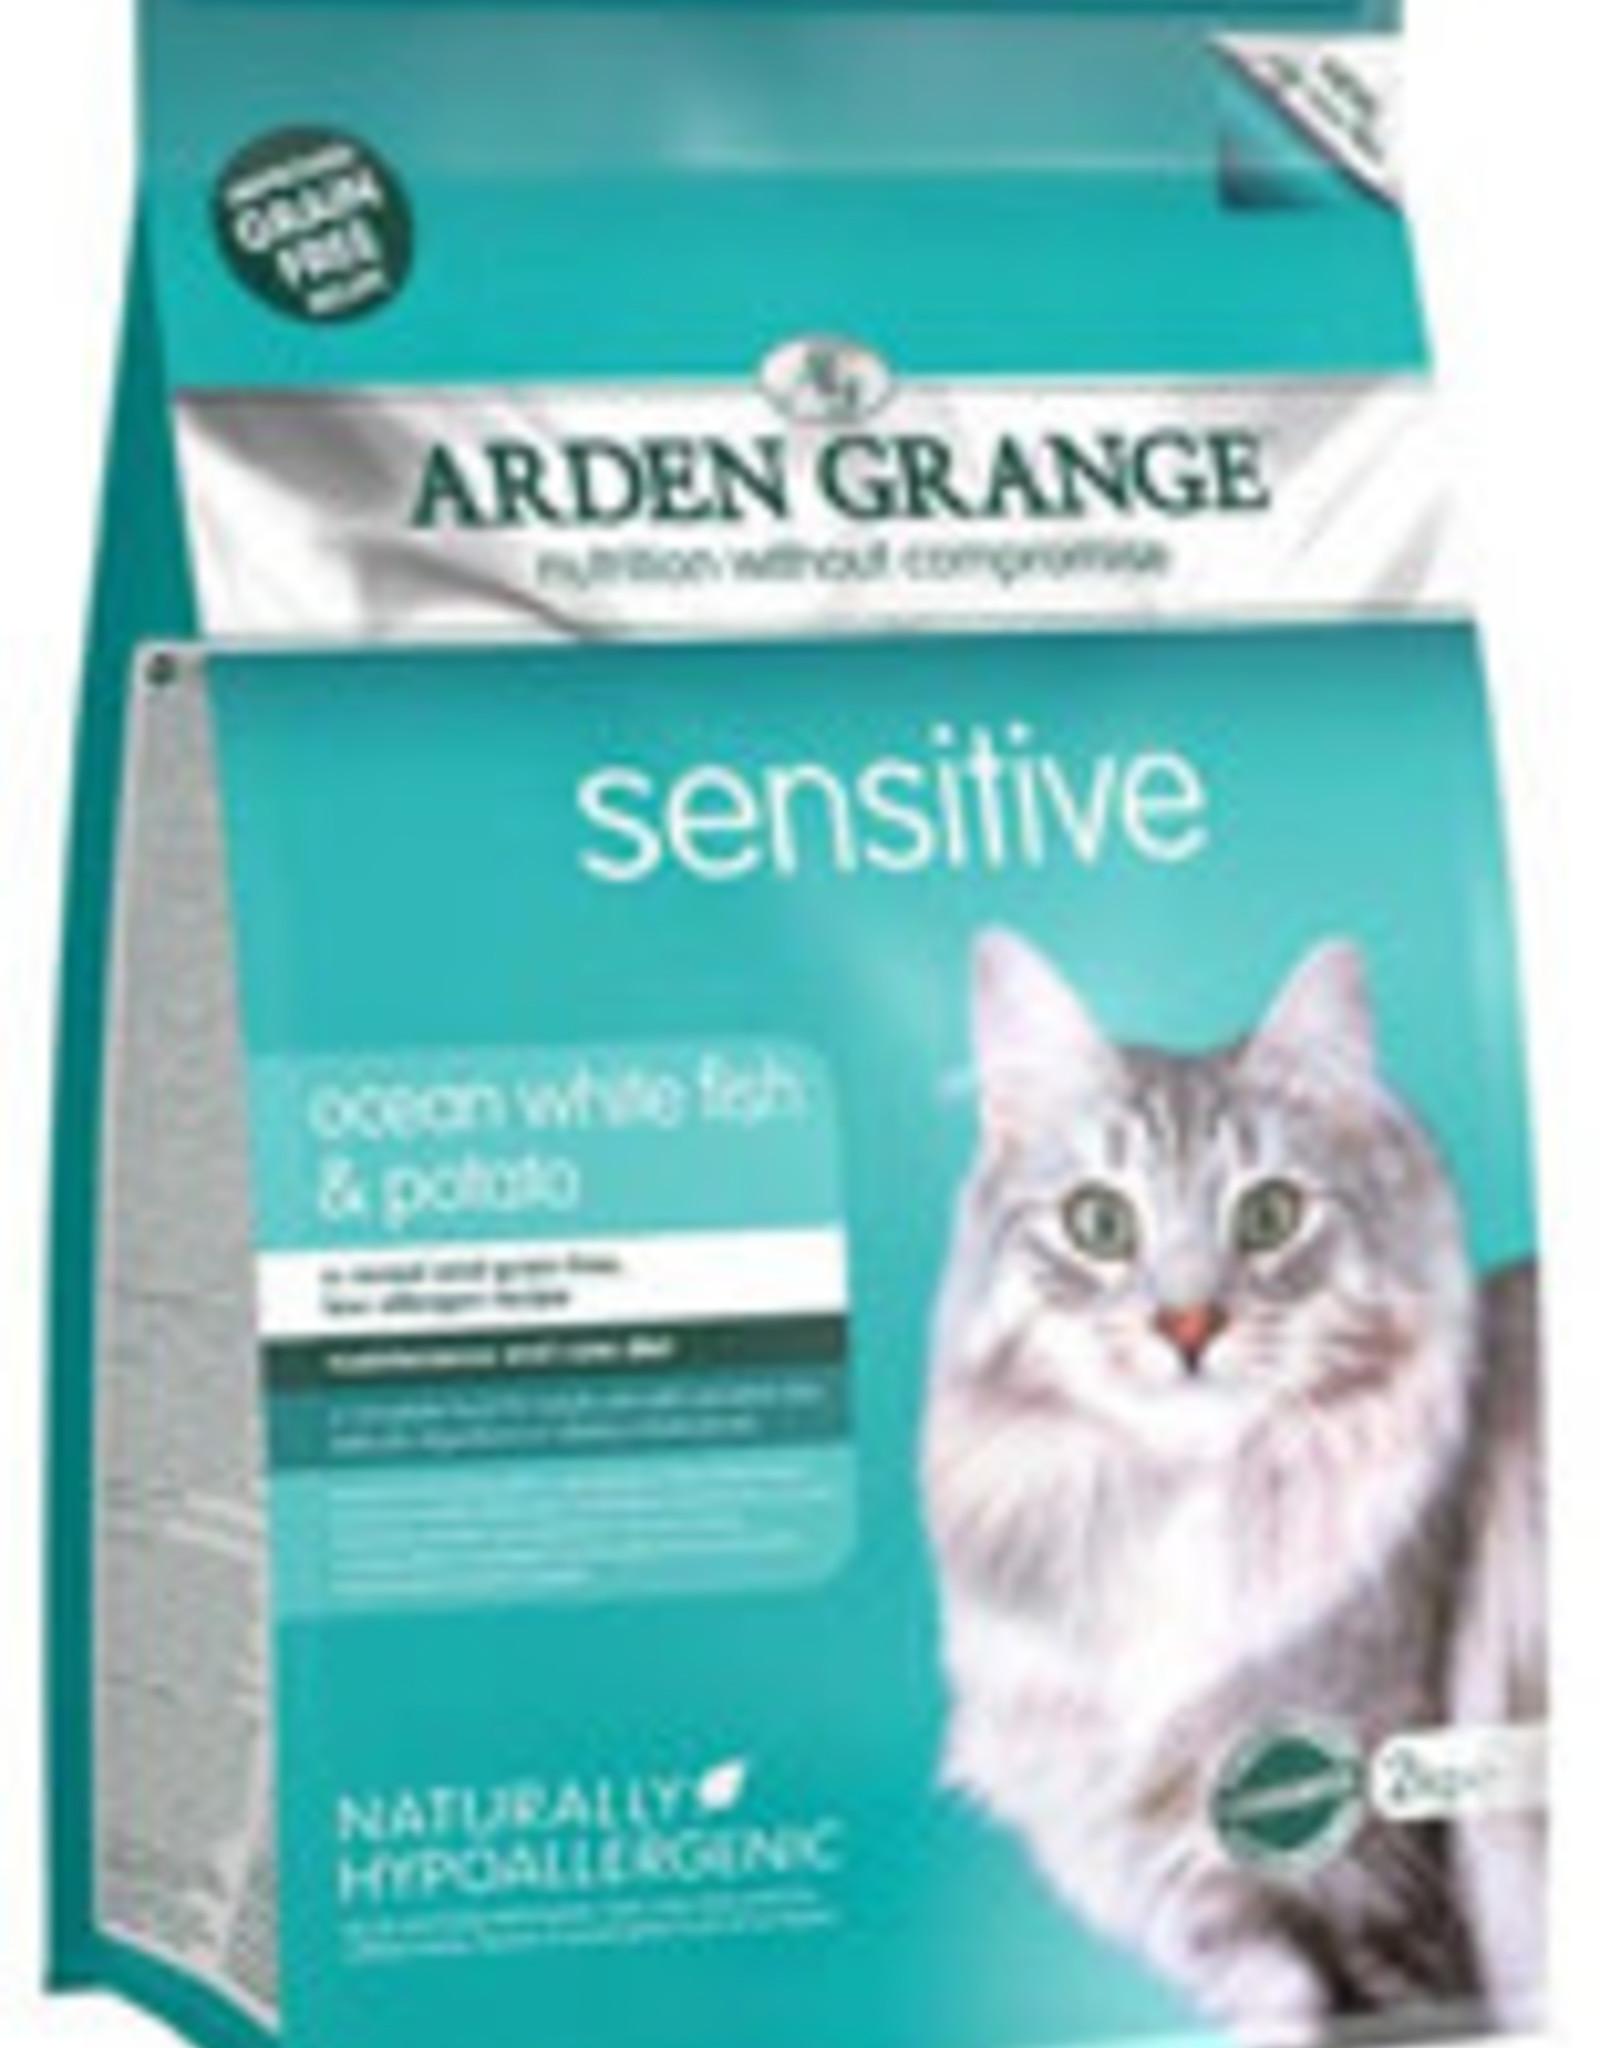 Arden Grange Grain Free Sensitive Cat Dry Food, Ocean White Fish & Potato